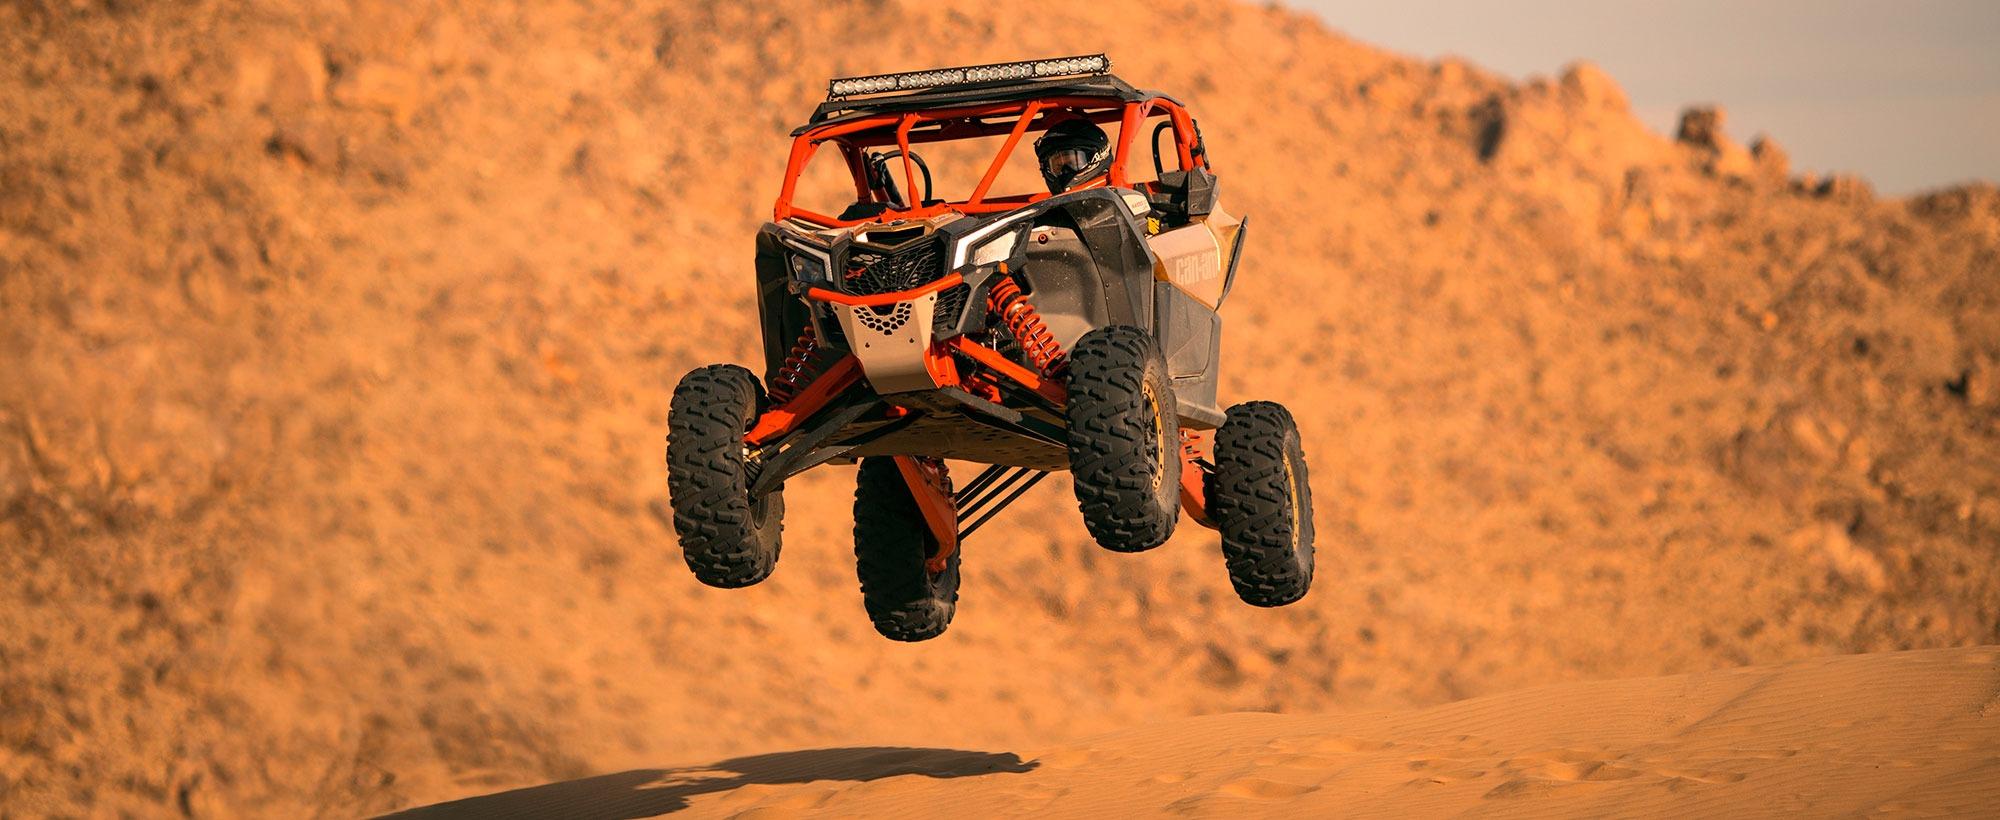 MAVERICK X3 X RS banner image 6